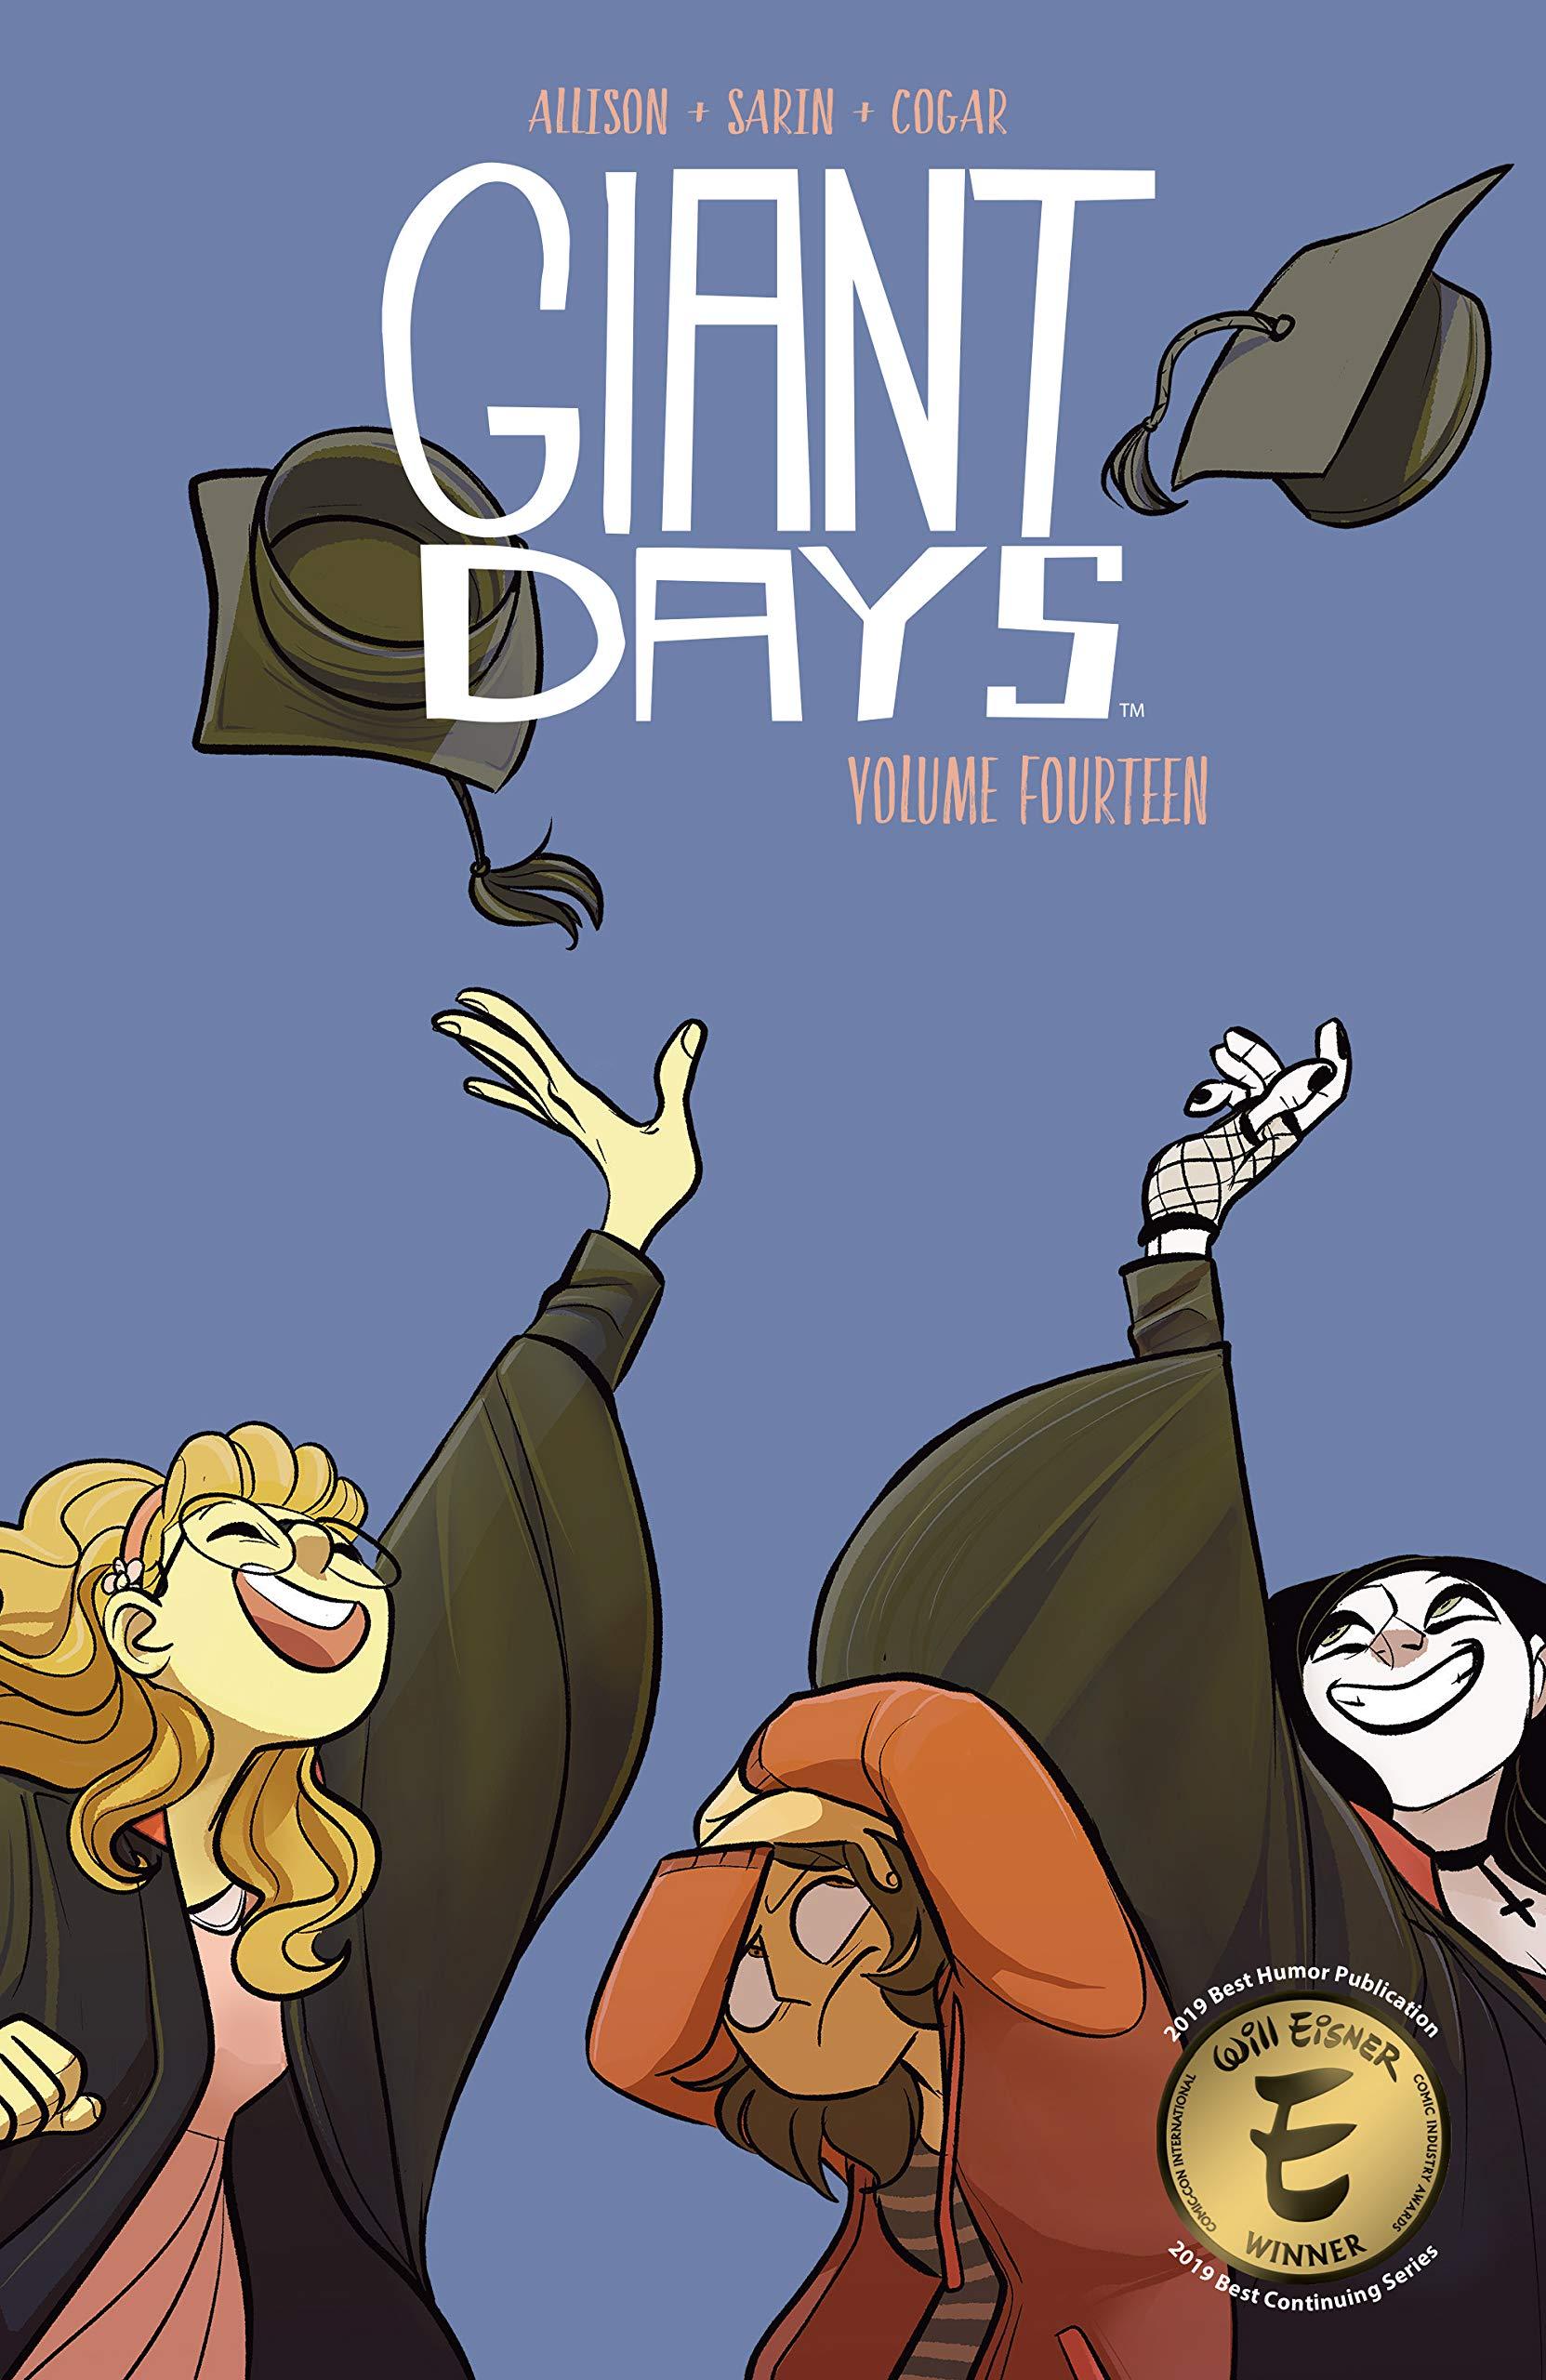 Giant Days Vol. 14